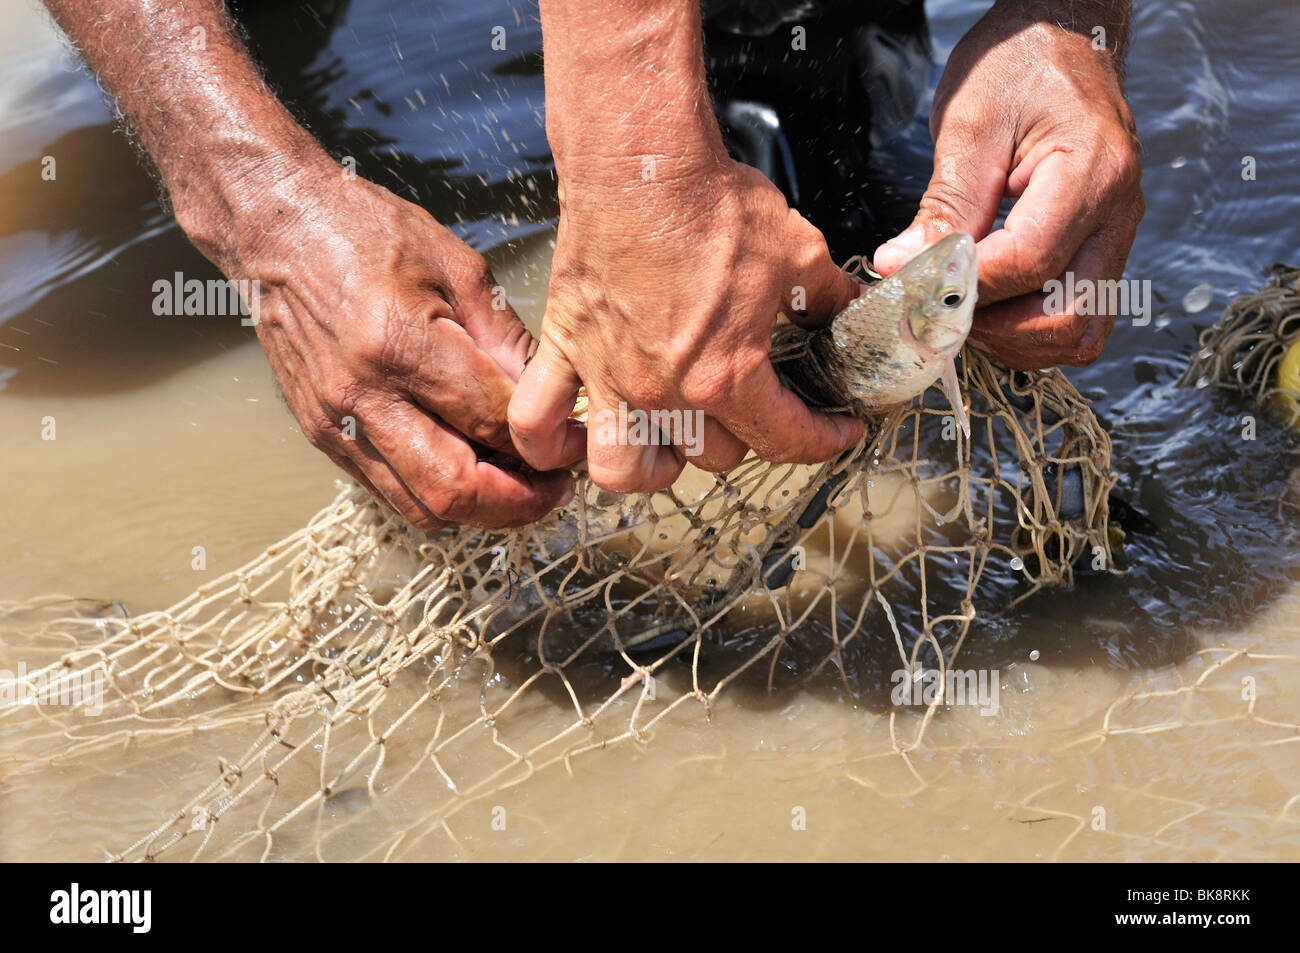 Fishermen taking a struggling fish out of a net, Rio Magdalena River, La Dorada, Caldas, Colombia, South America - Stock Image